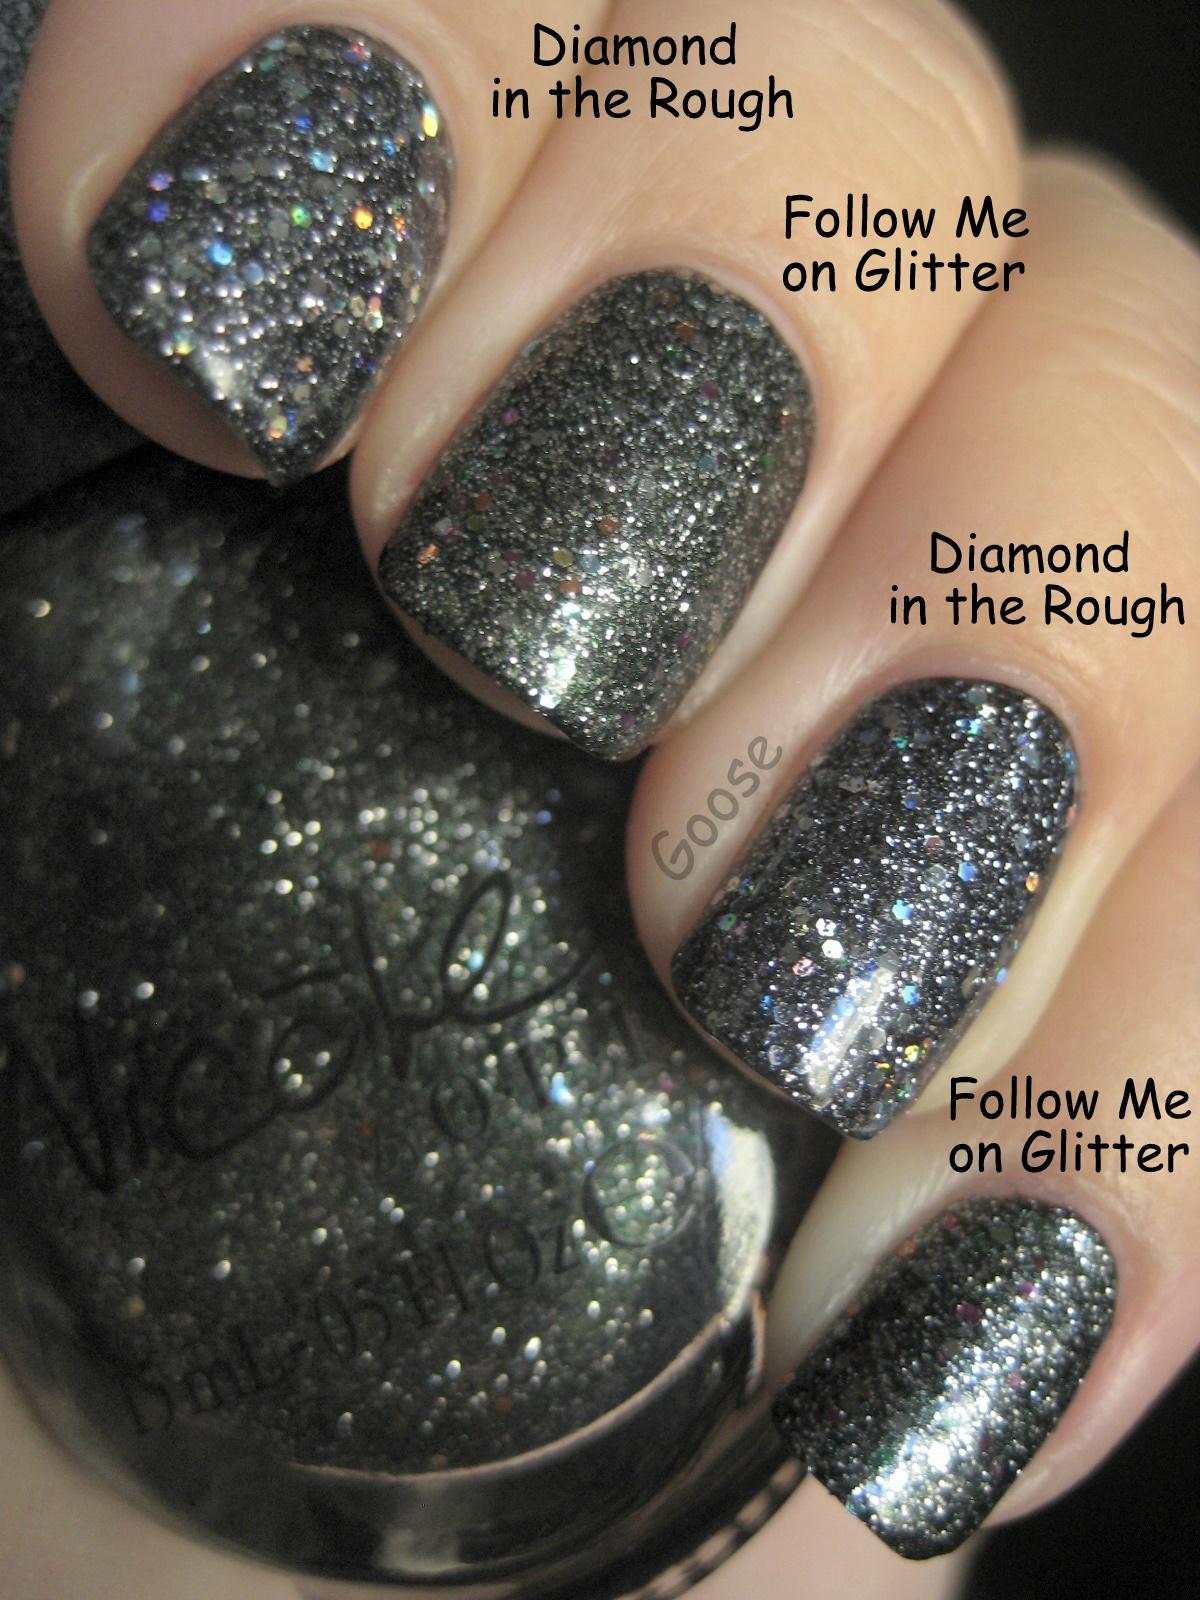 Goose\'s Glitter: Some Nicole by OPI Kardashian Kolors